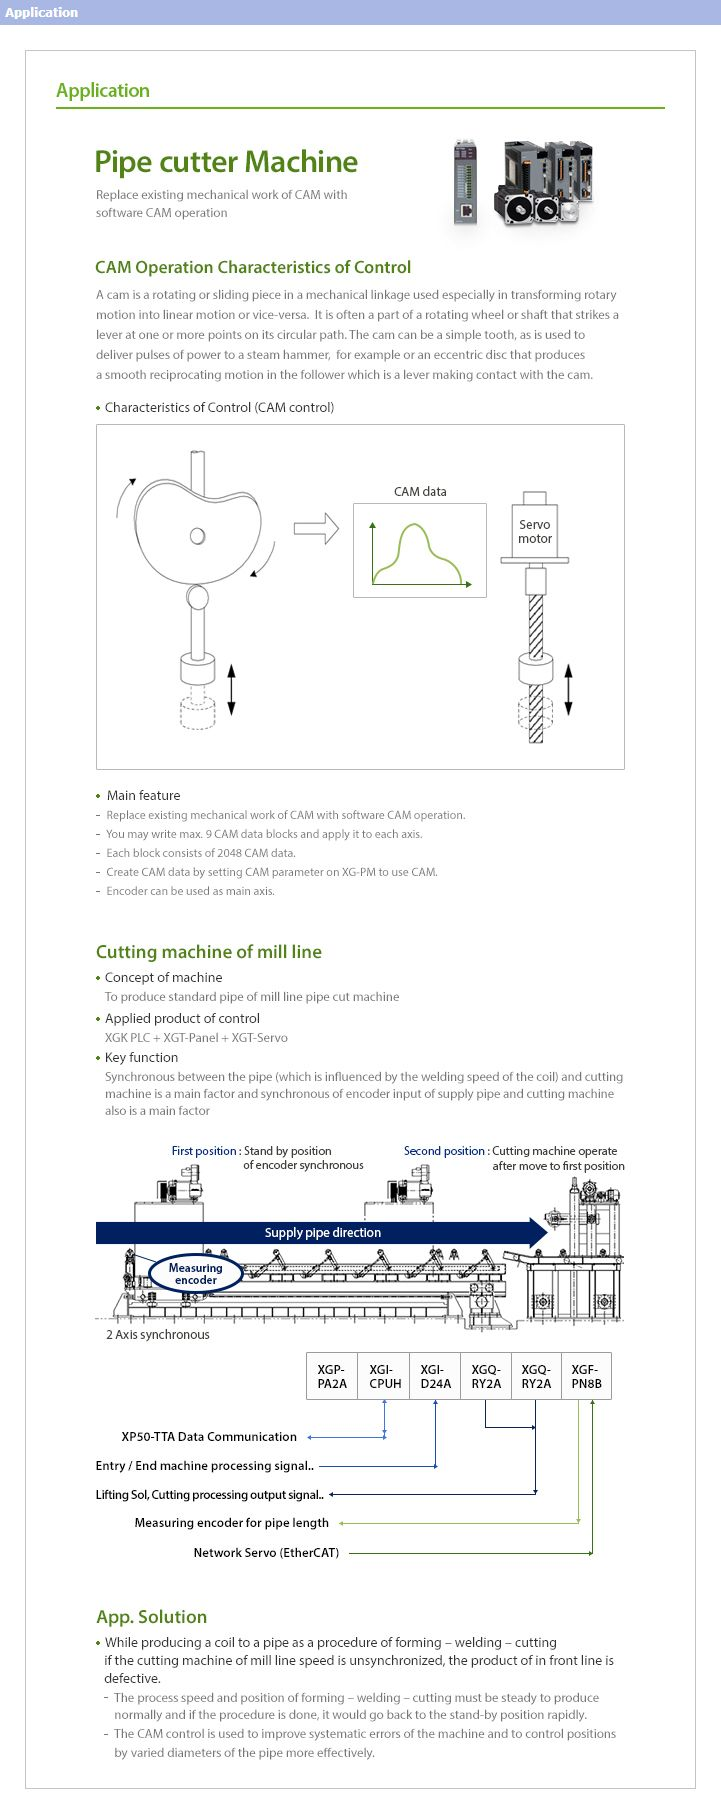 Pipe Cutter Machine Application Plc Xgk Xgt Panel Servo Logic Control Diagram